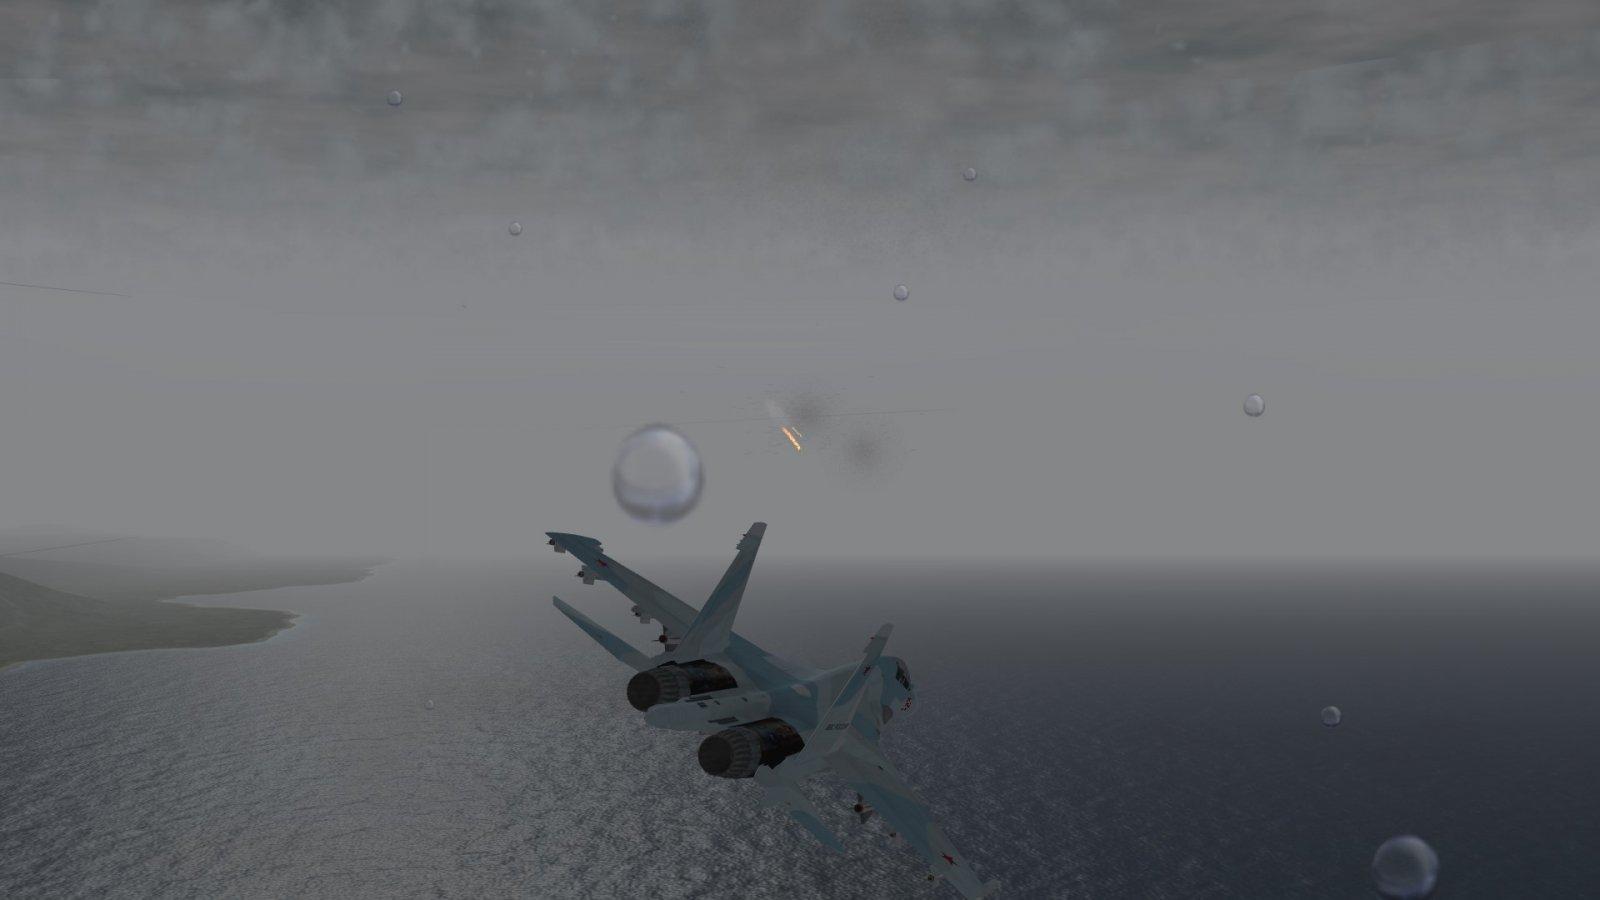 Su-30 Racing to Intercept Thru the Rain